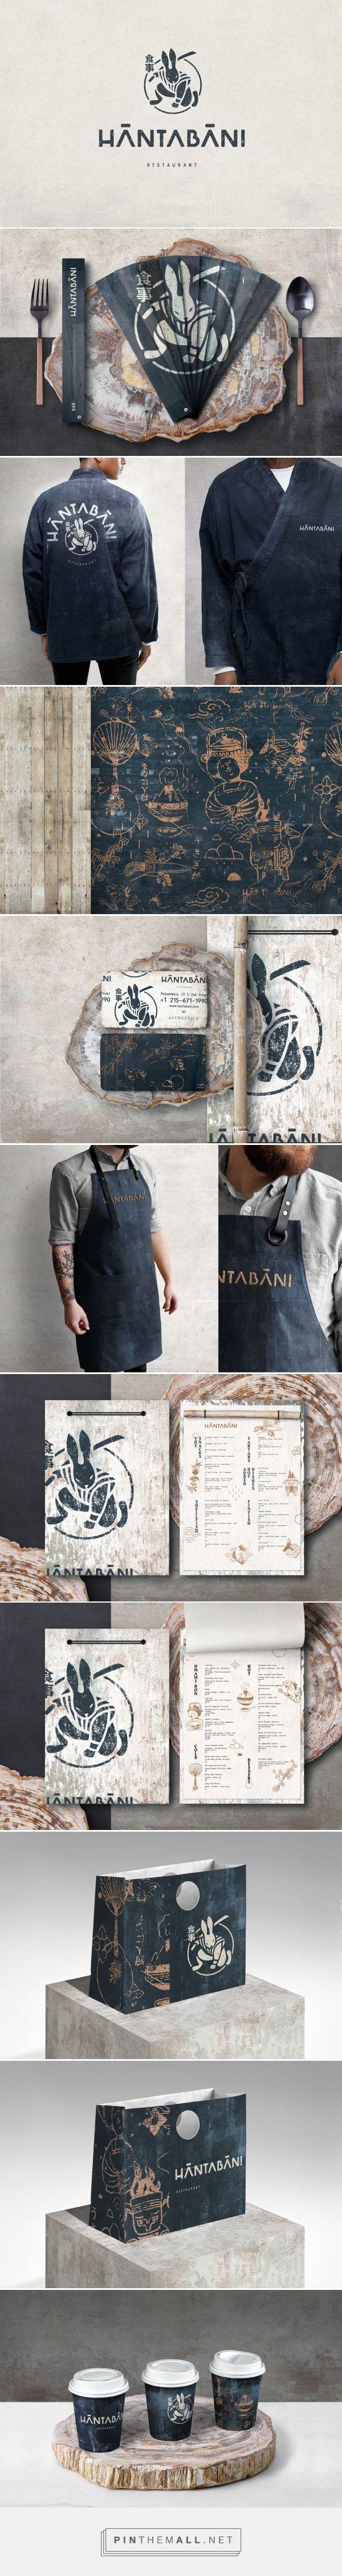 Hantabani Japanese Restaurant Branding and Menu Design by No Name Branding